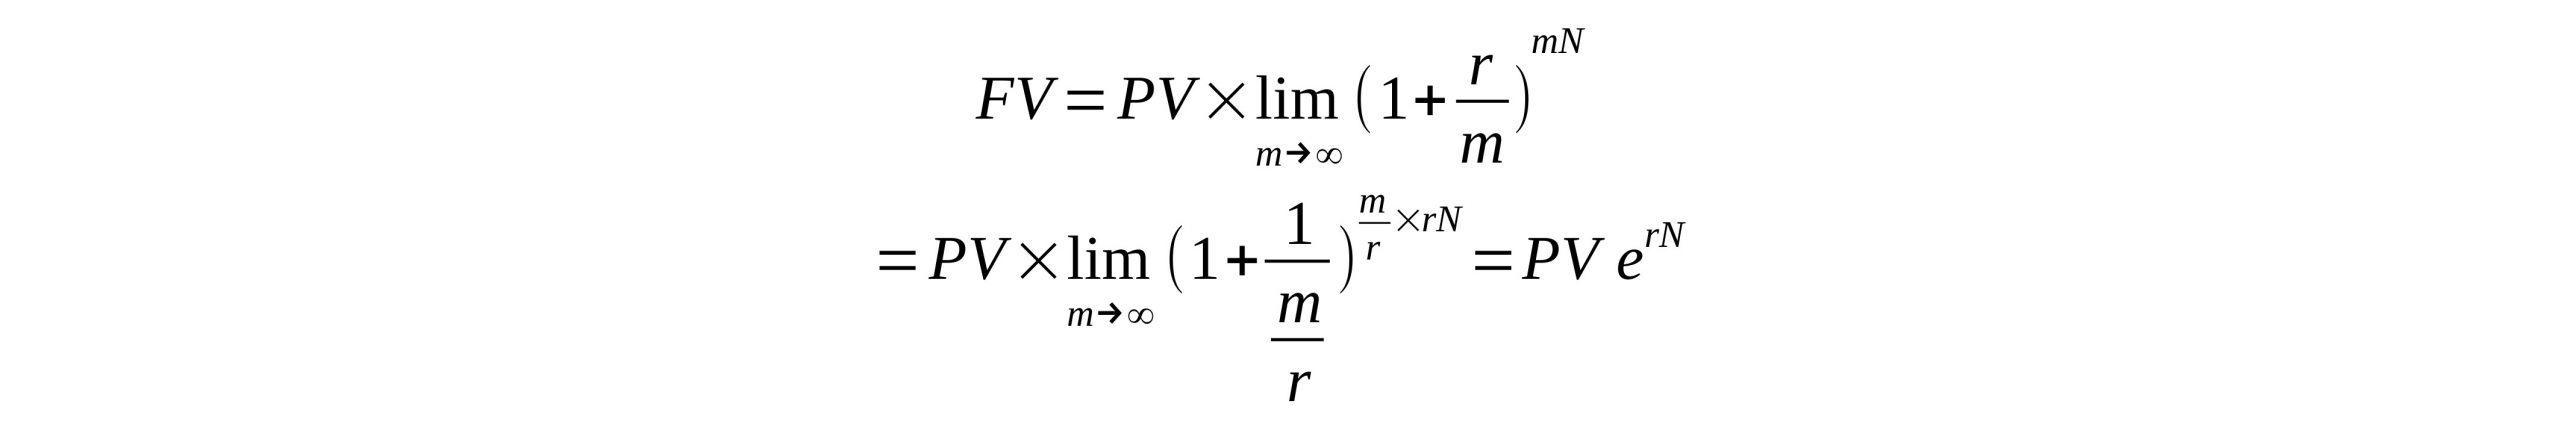 فرمول سود مرکب پیوسته